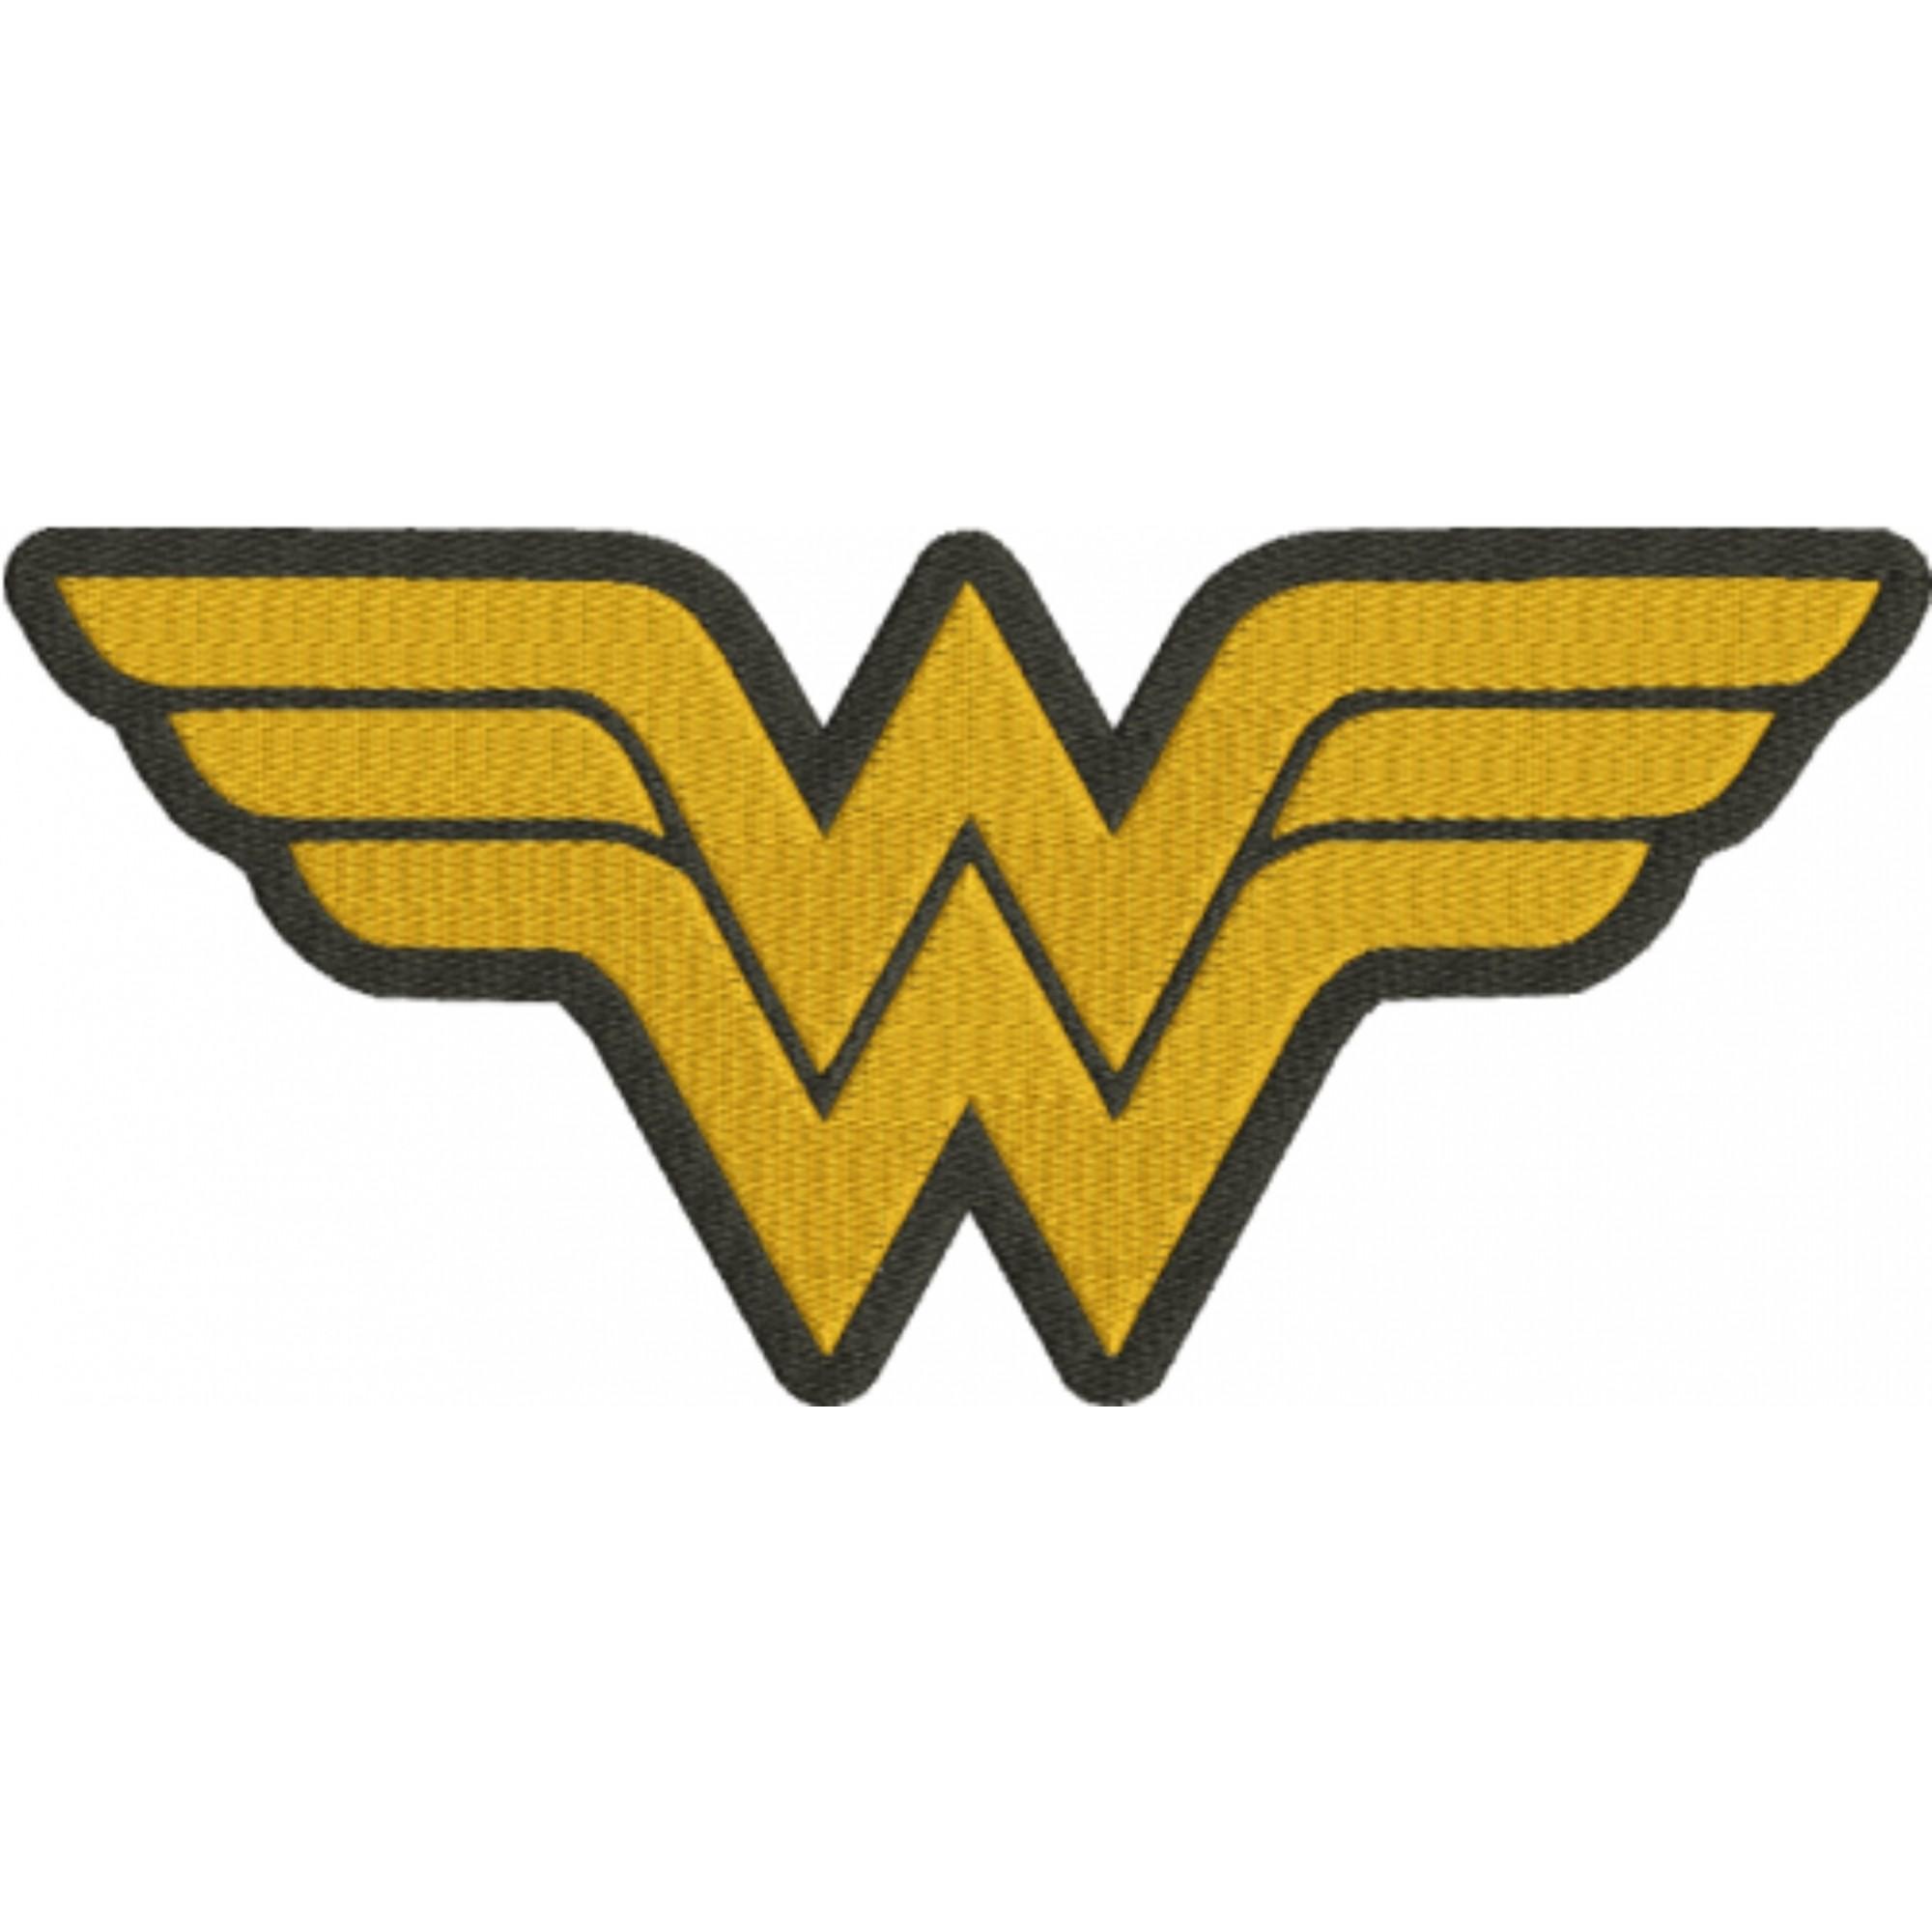 Luminária/Abajur: Logo Mulher Maravilha (Wonder Woman)